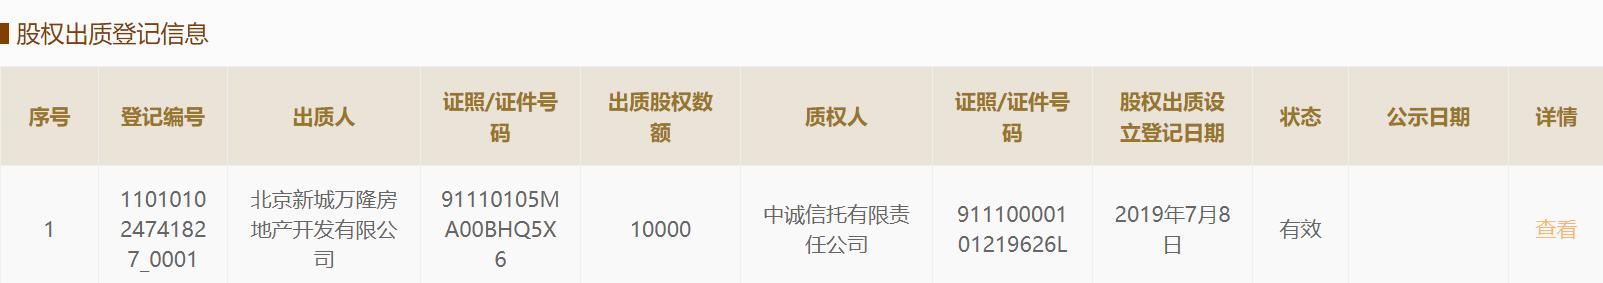 <b>新城旗下公司股权出质予中诚信托 去年在京大举拿地</b>